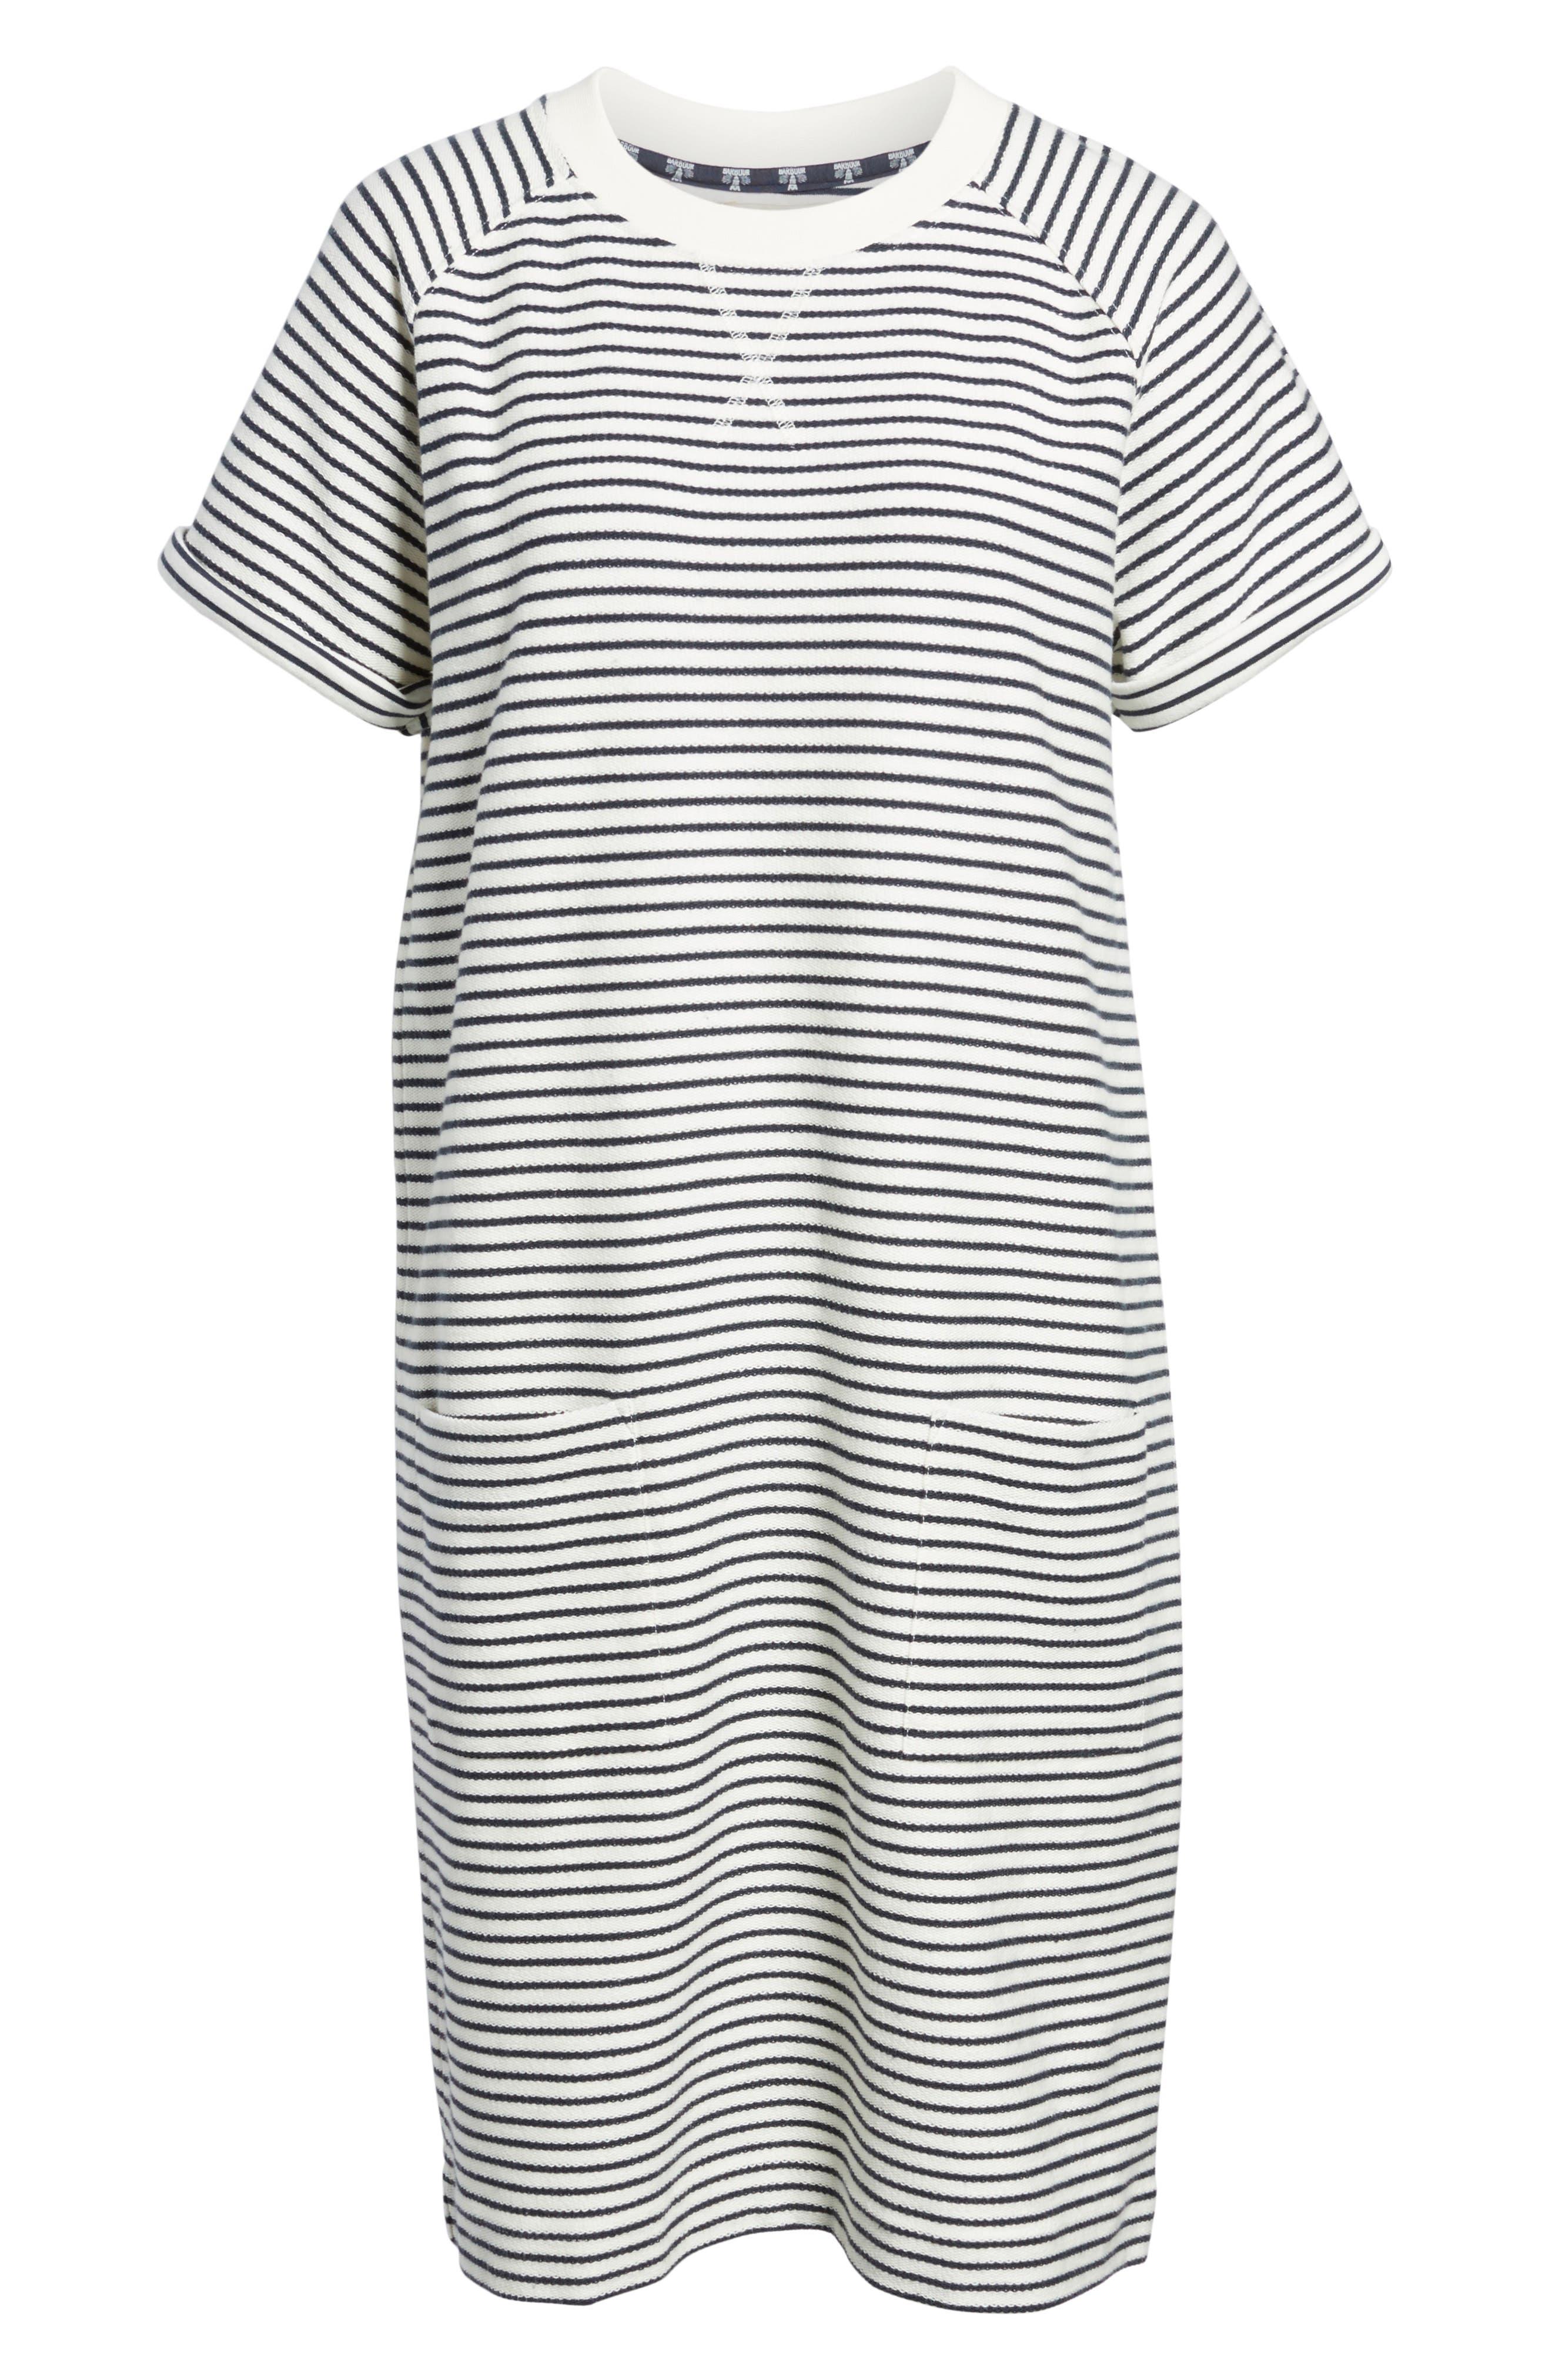 Monreith Stripe Shift Dress,                             Alternate thumbnail 6, color,                             White/ Navy